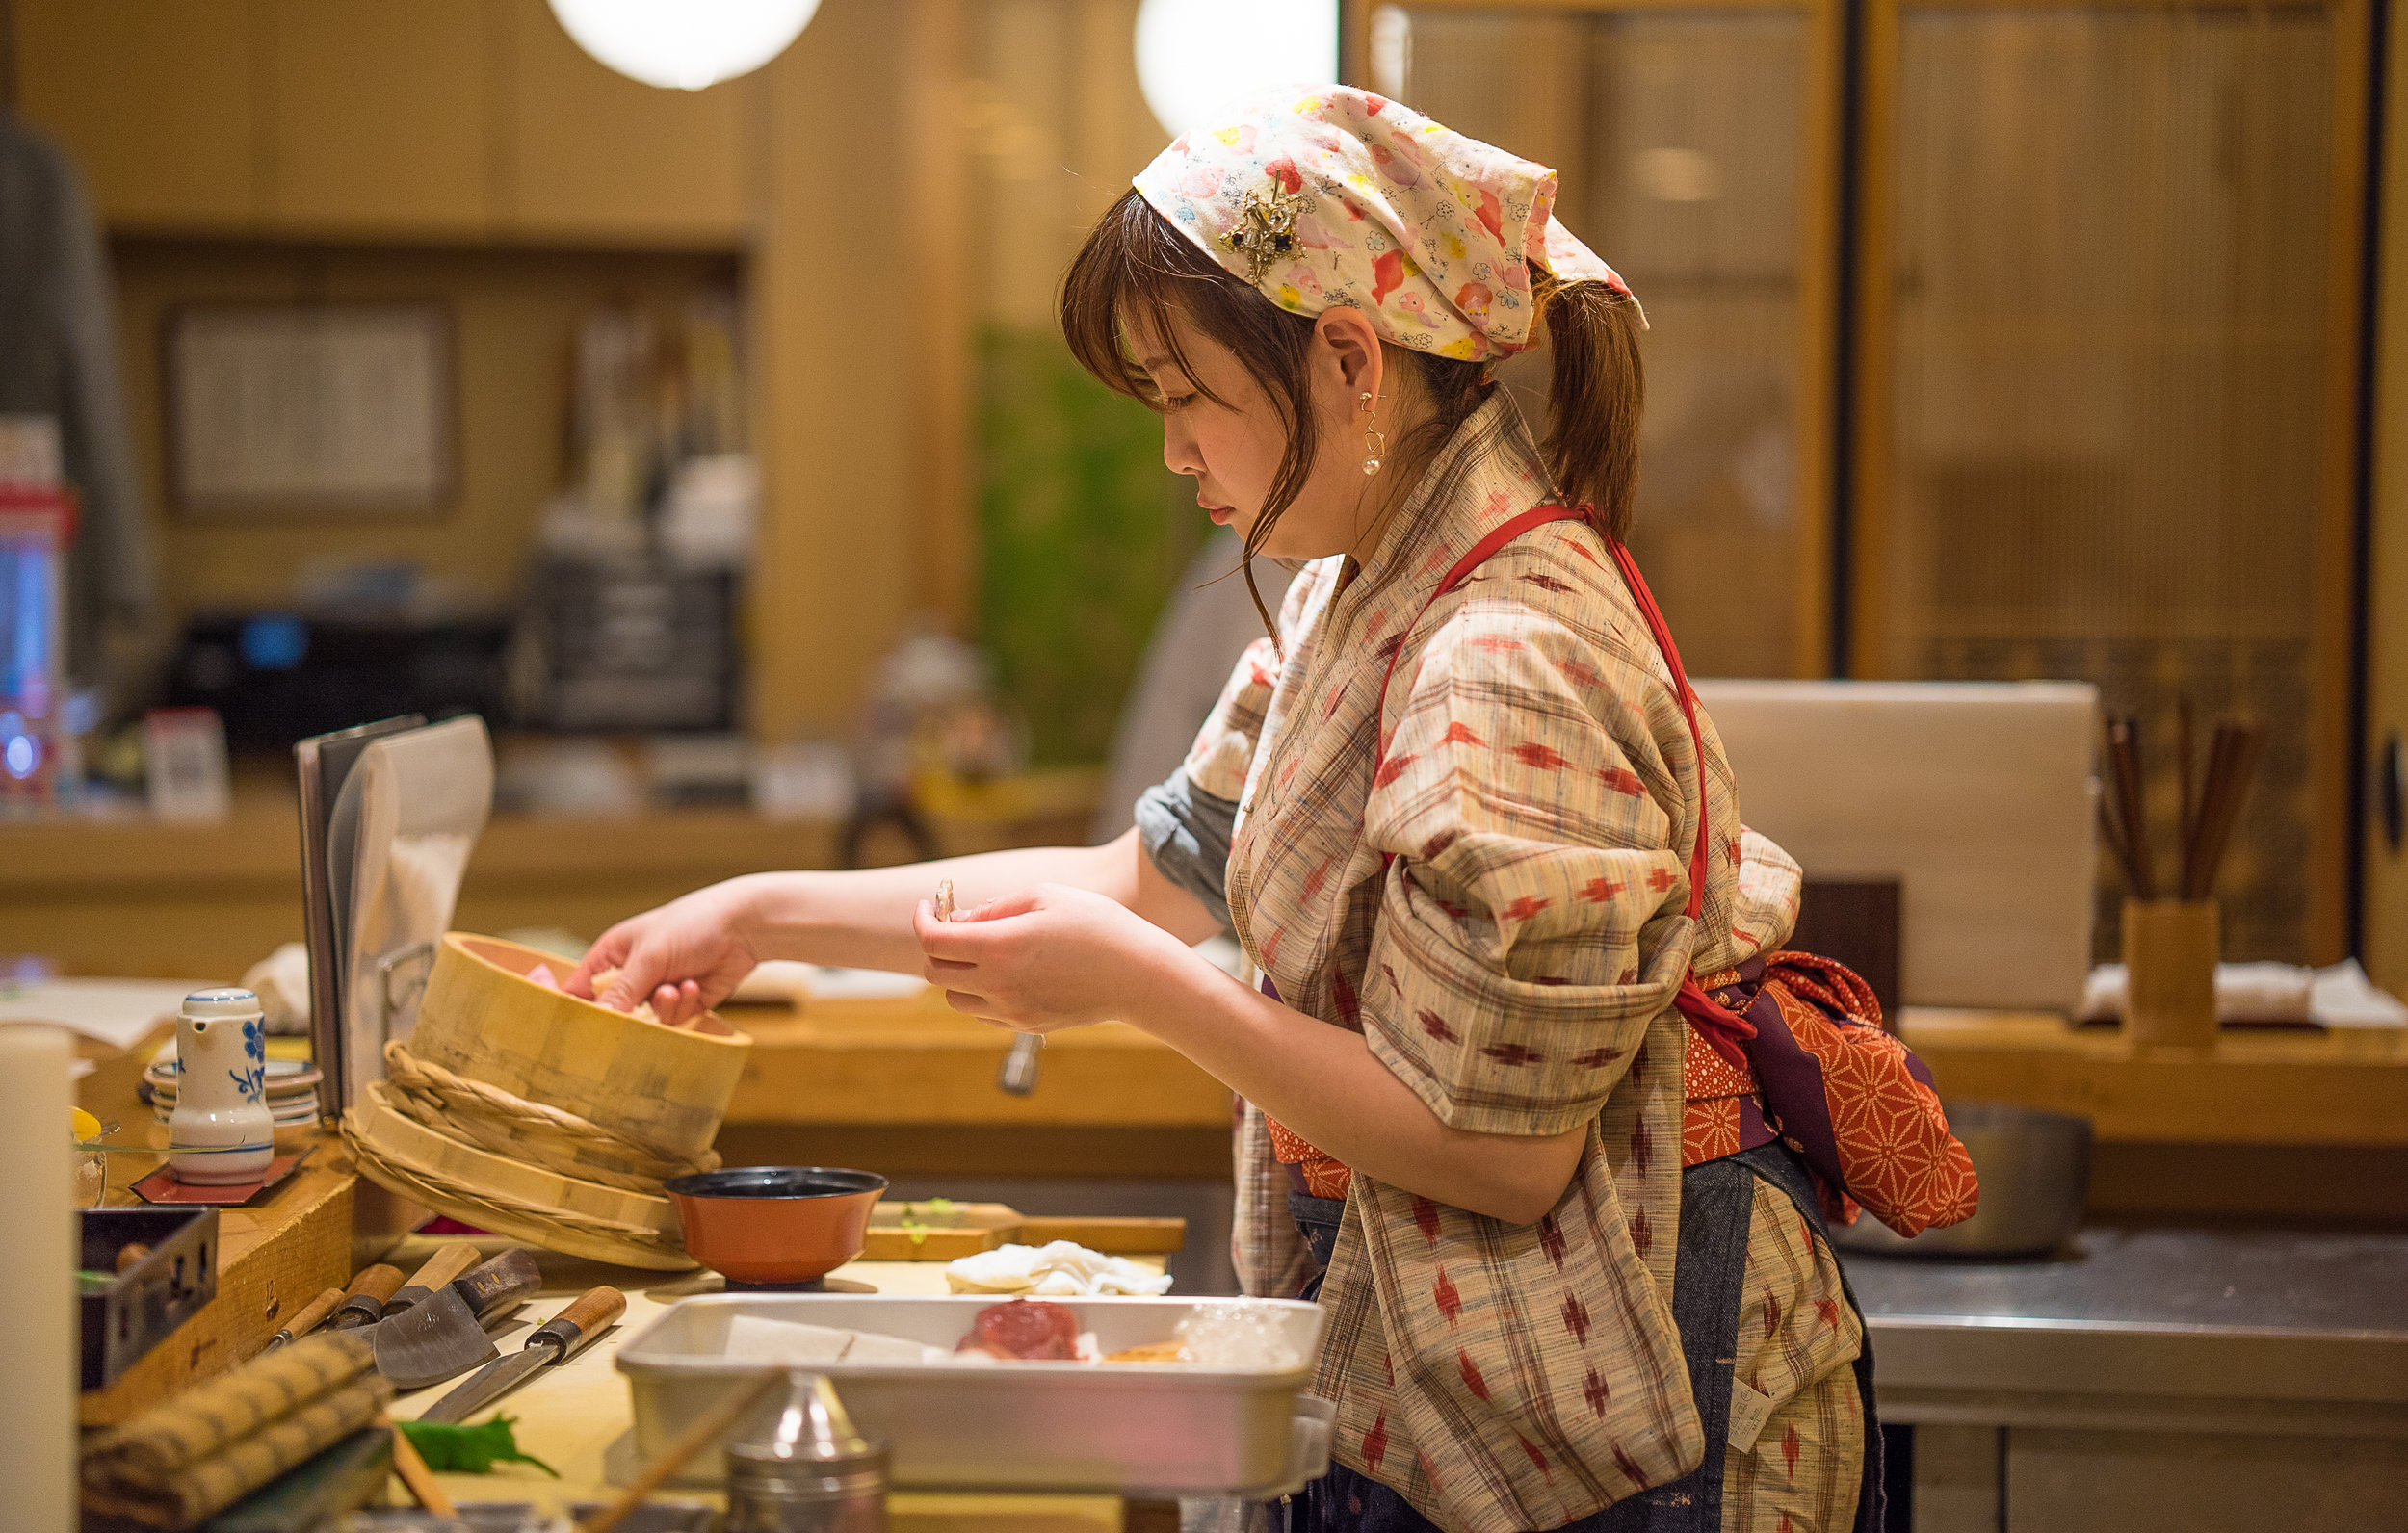 Yuki prepares rice for guests at Nadeshiko Sushi. (Courtesy of Amarachi Nwosu / Malala Fund)